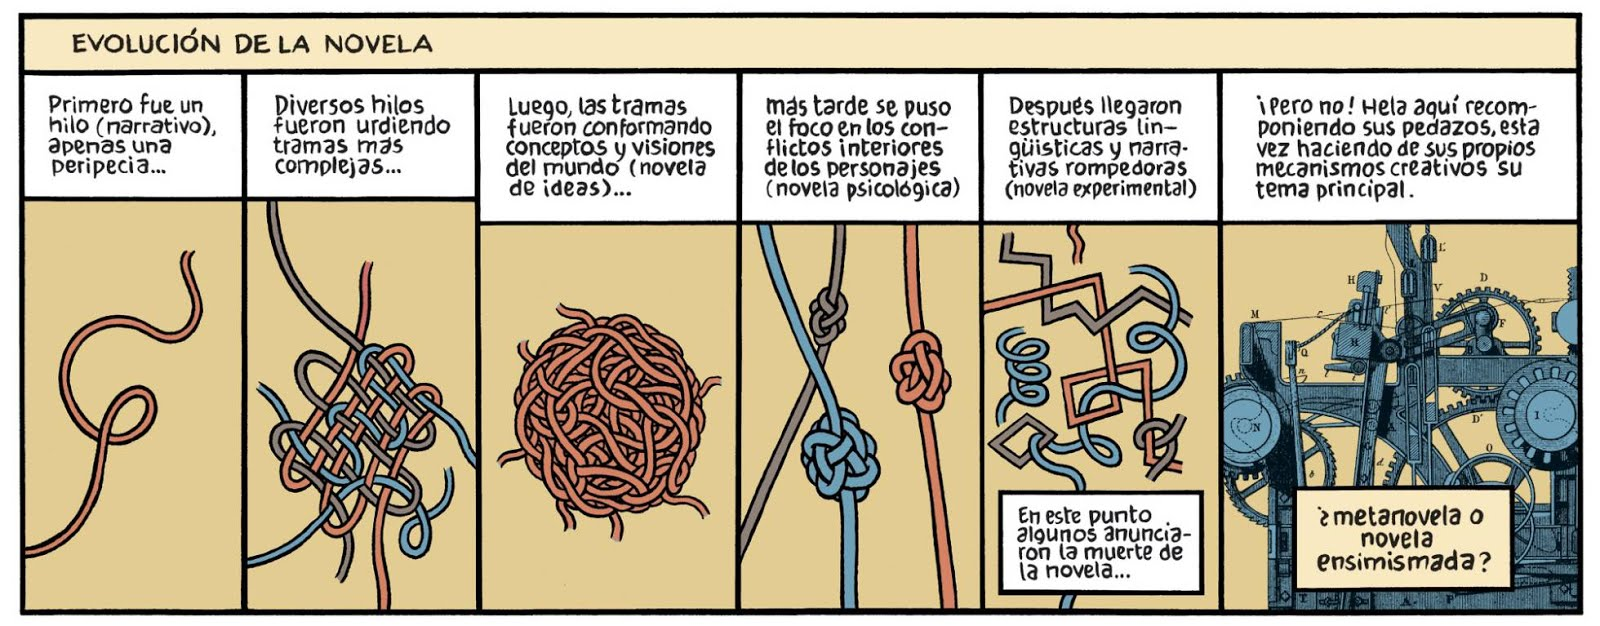 Trampantojo, por Max: LA EVOLUCIÓN DE LA NOVELA